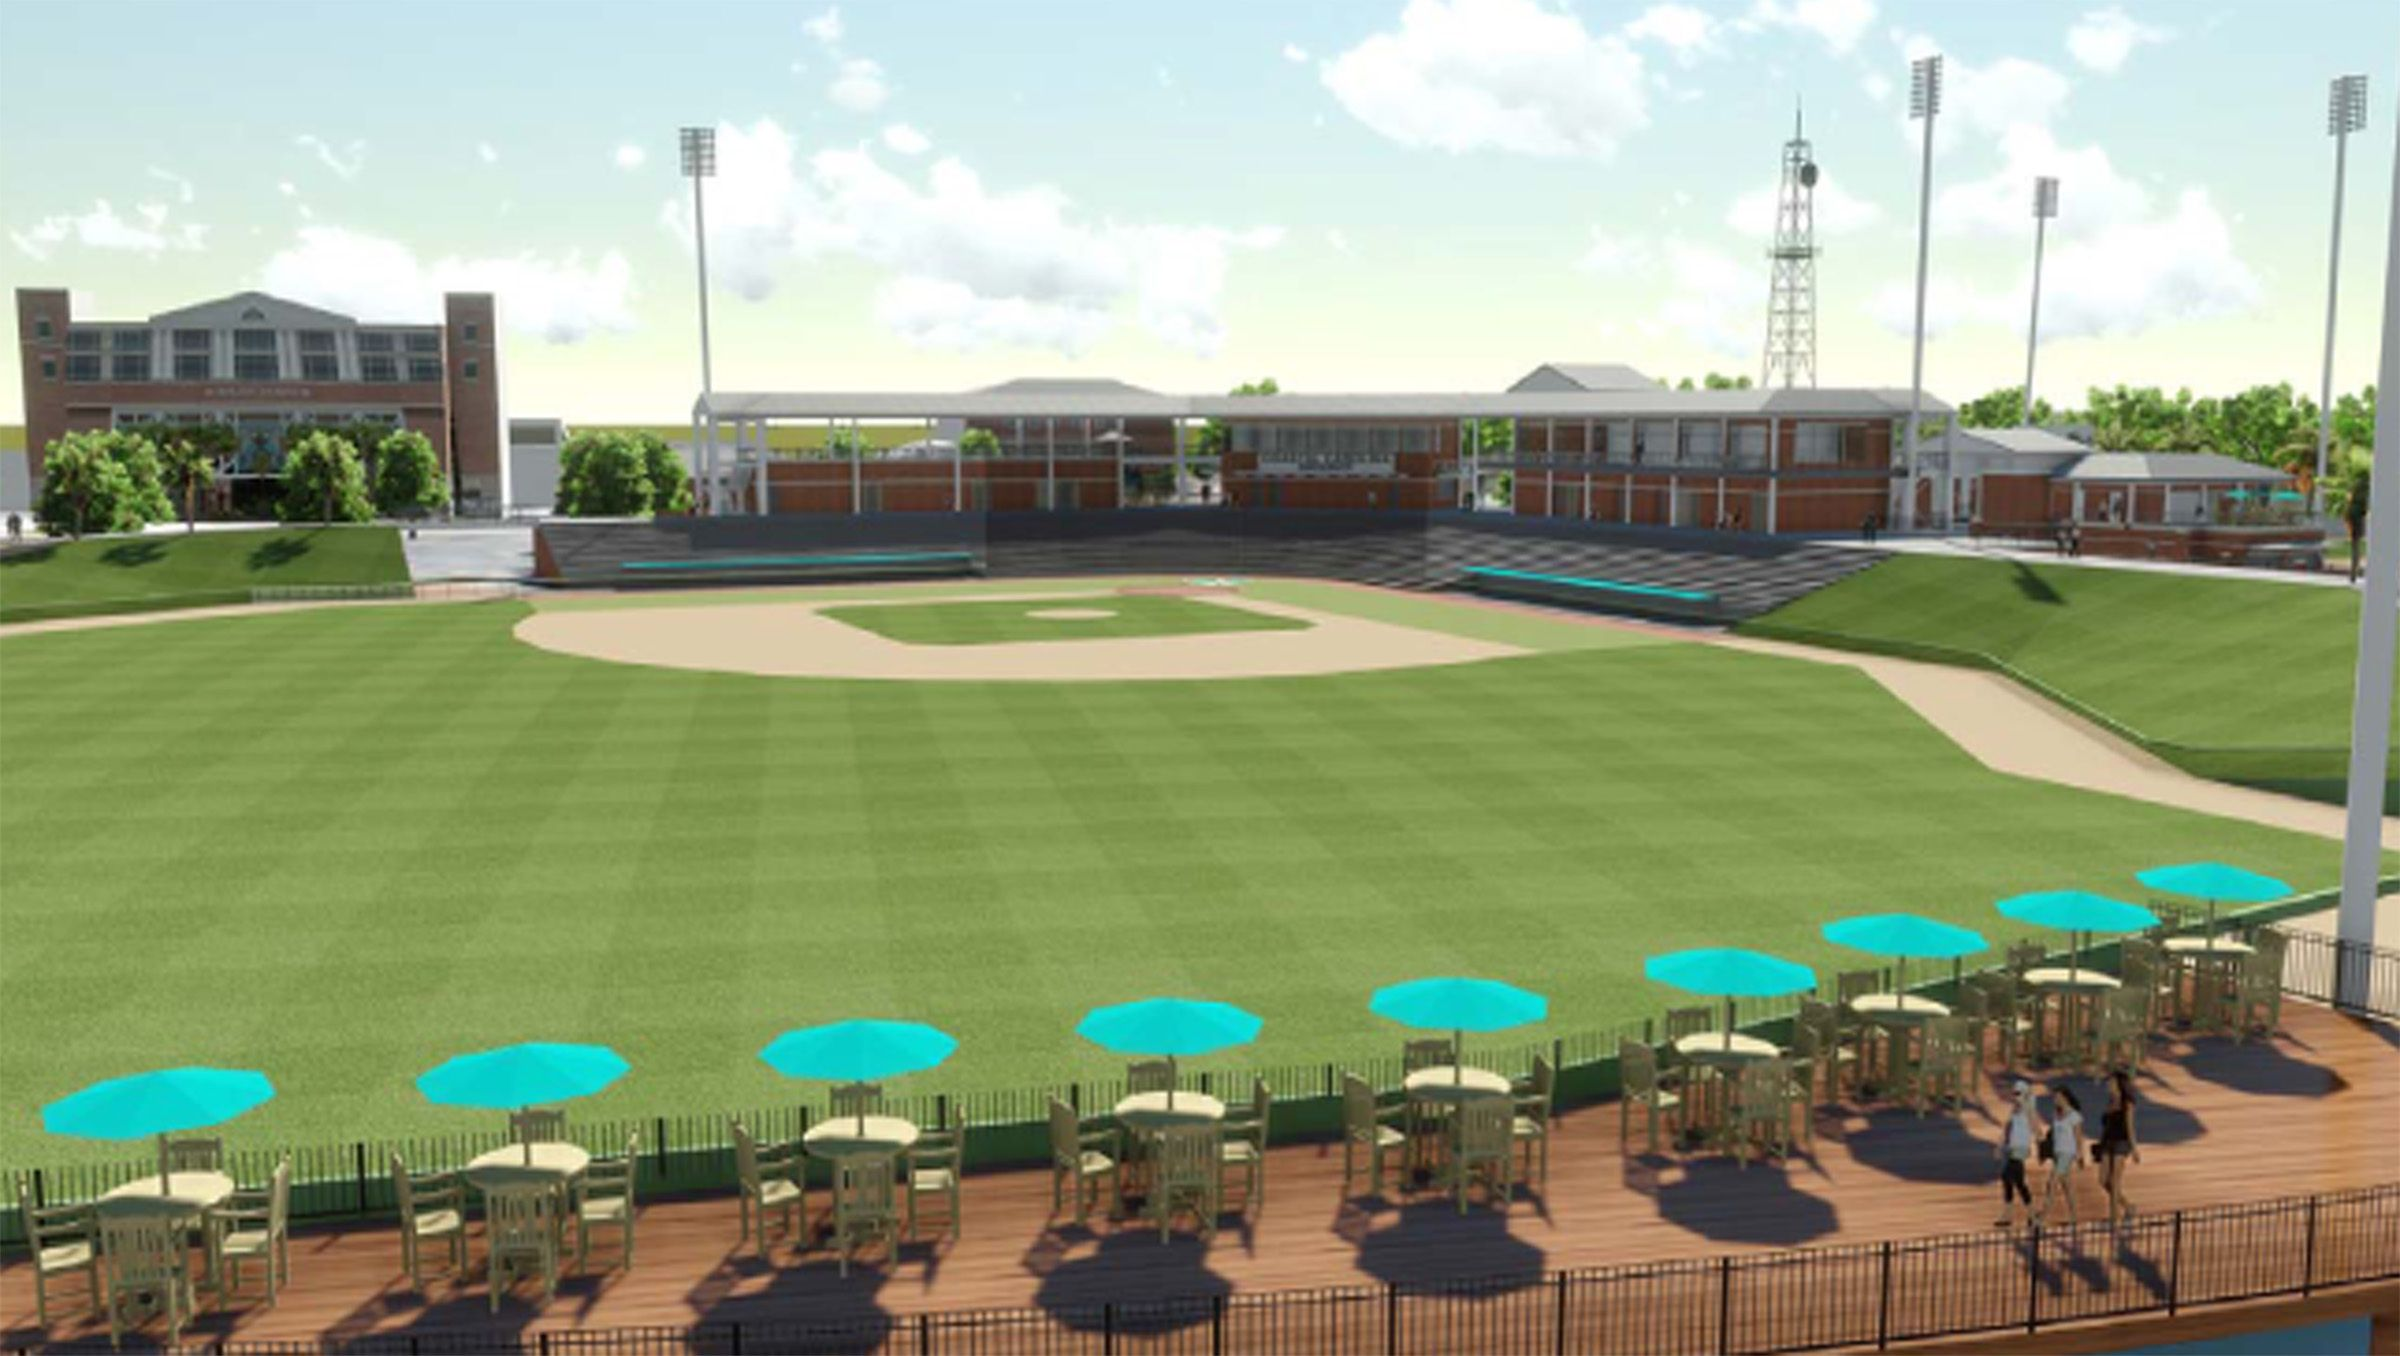 Baseball Stadium Rendering Coastal carolina university